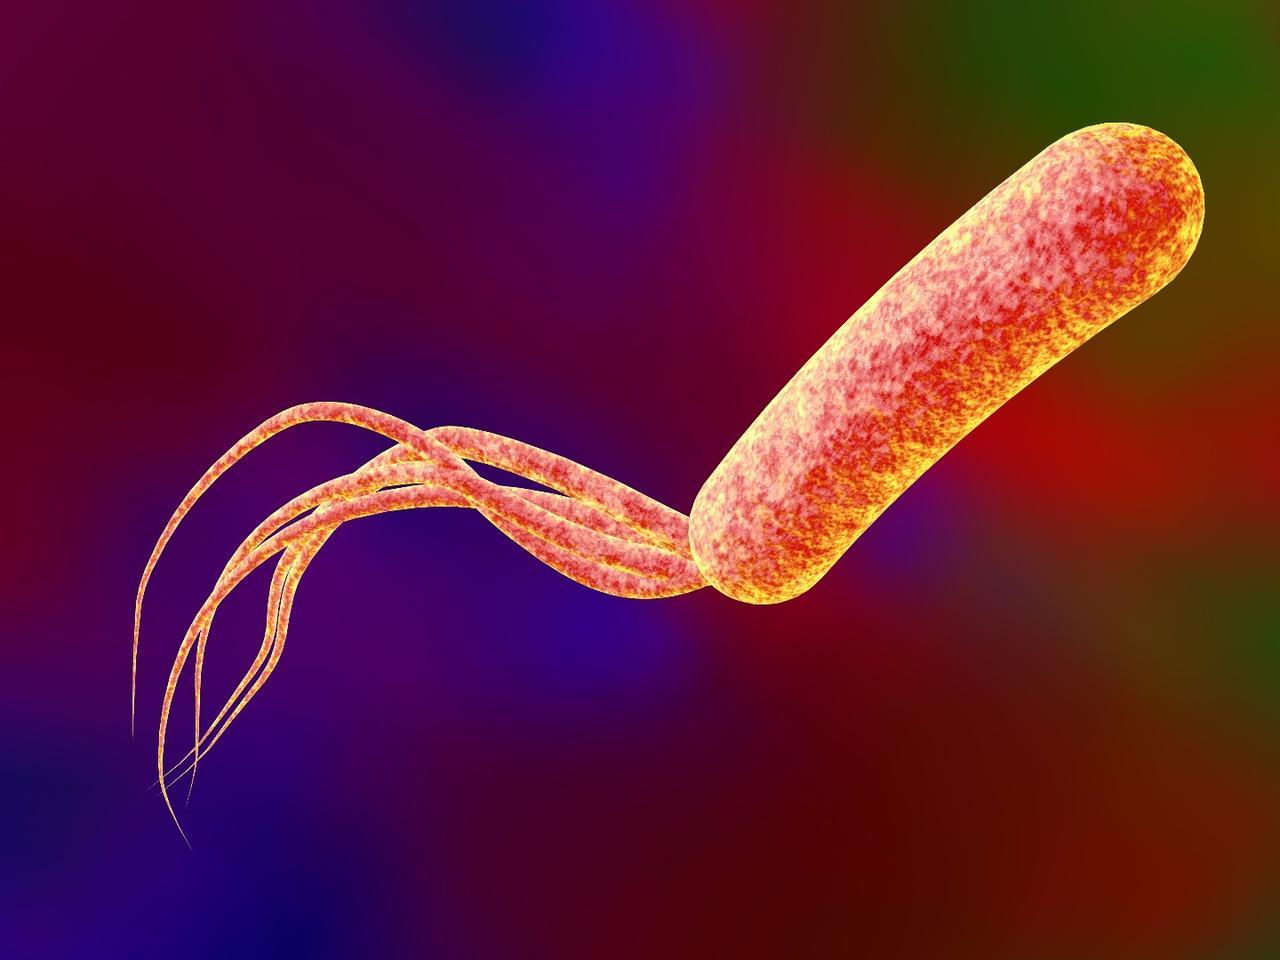 A rendering of a Pseudomonas aeruginosa bacterium